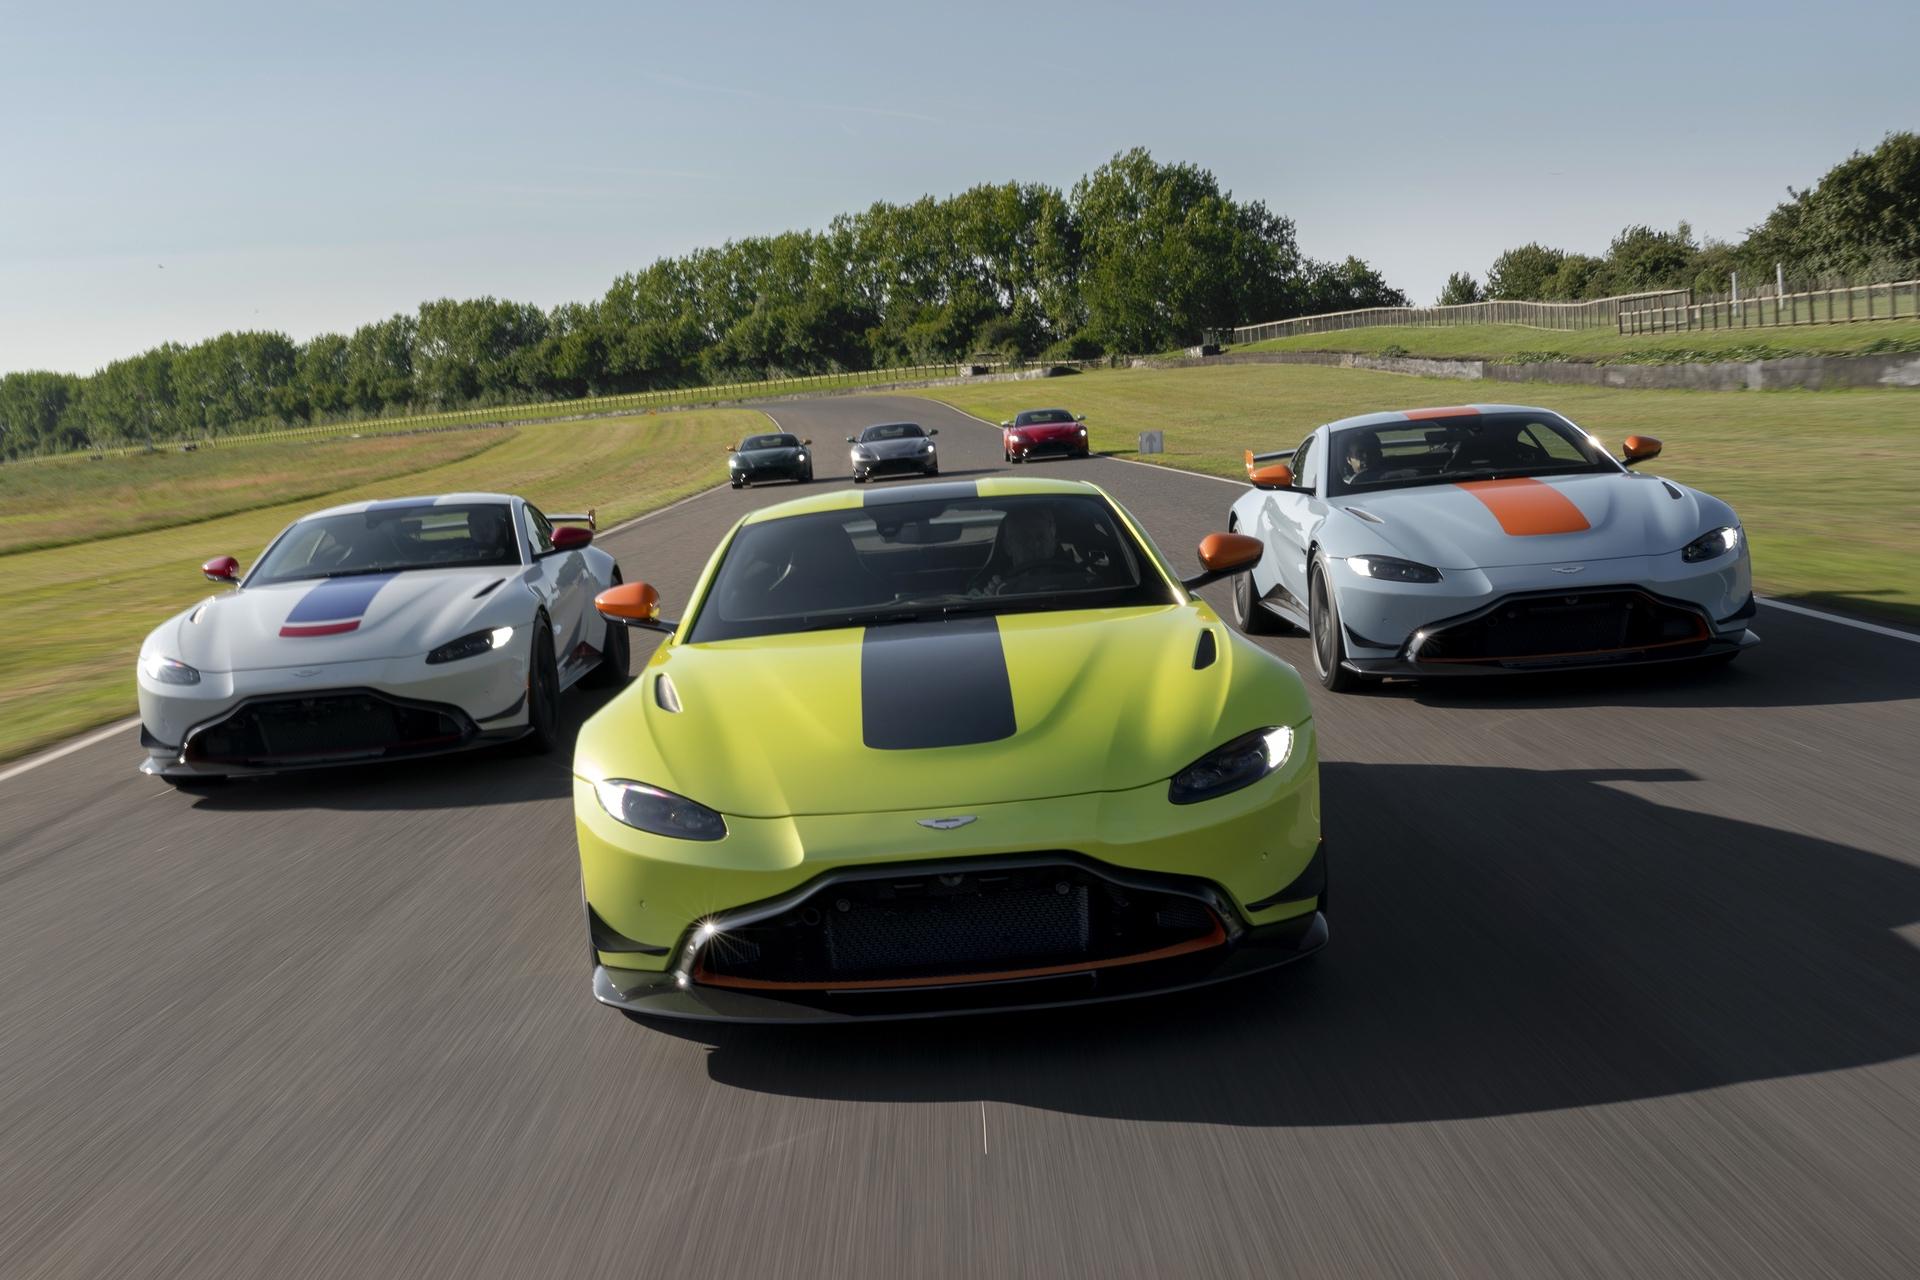 Aston-Martin_Goodwood-FoS-2019_11